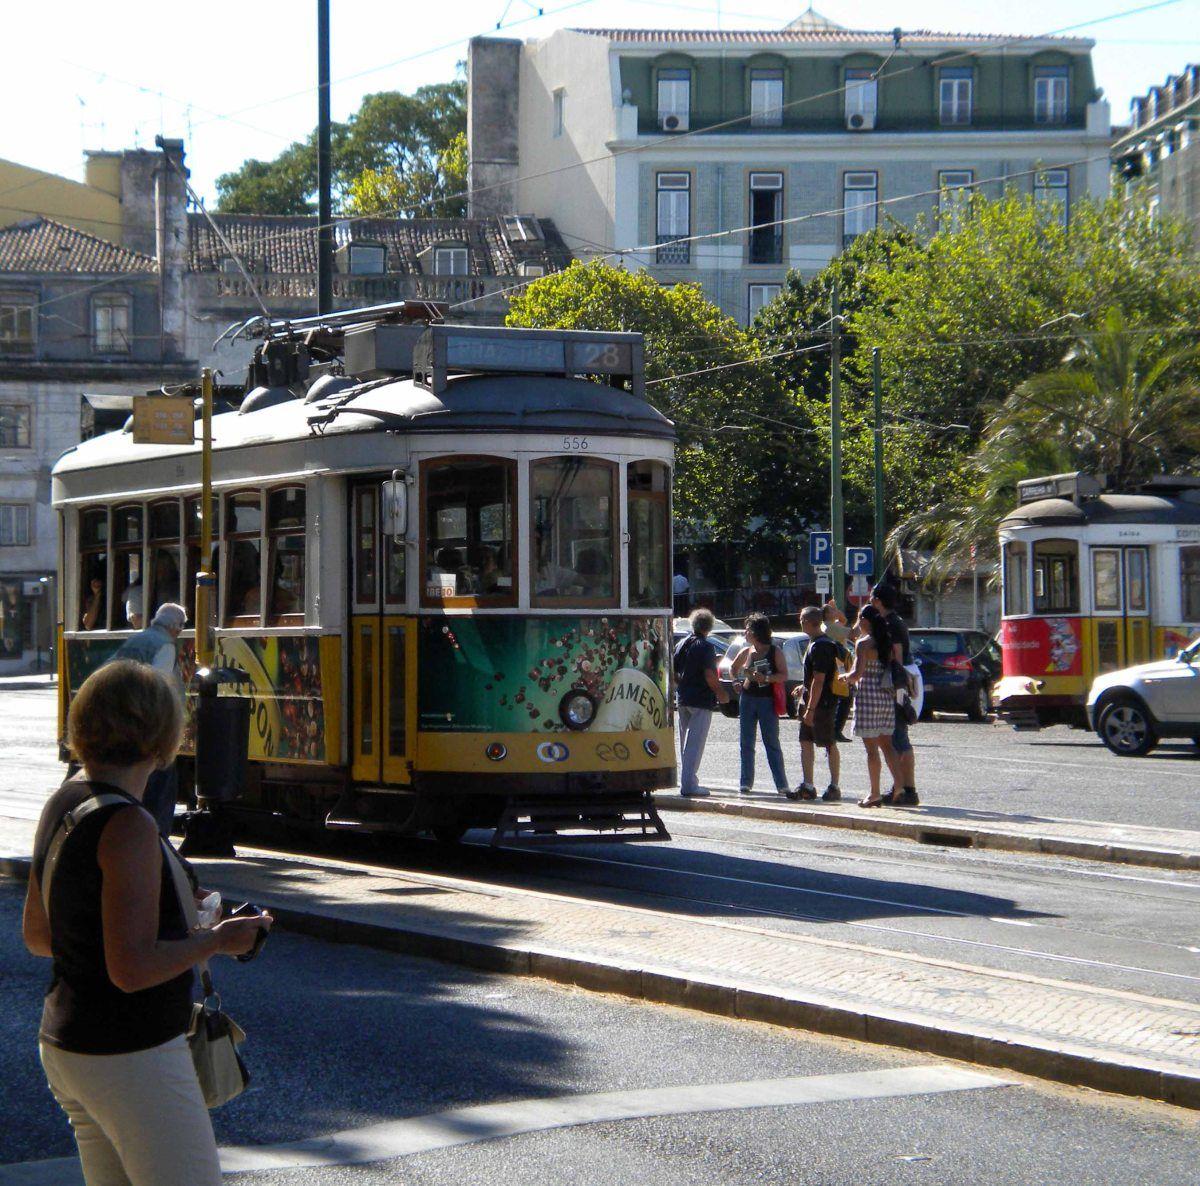 Tranvía de la línea 28 de Lisboa